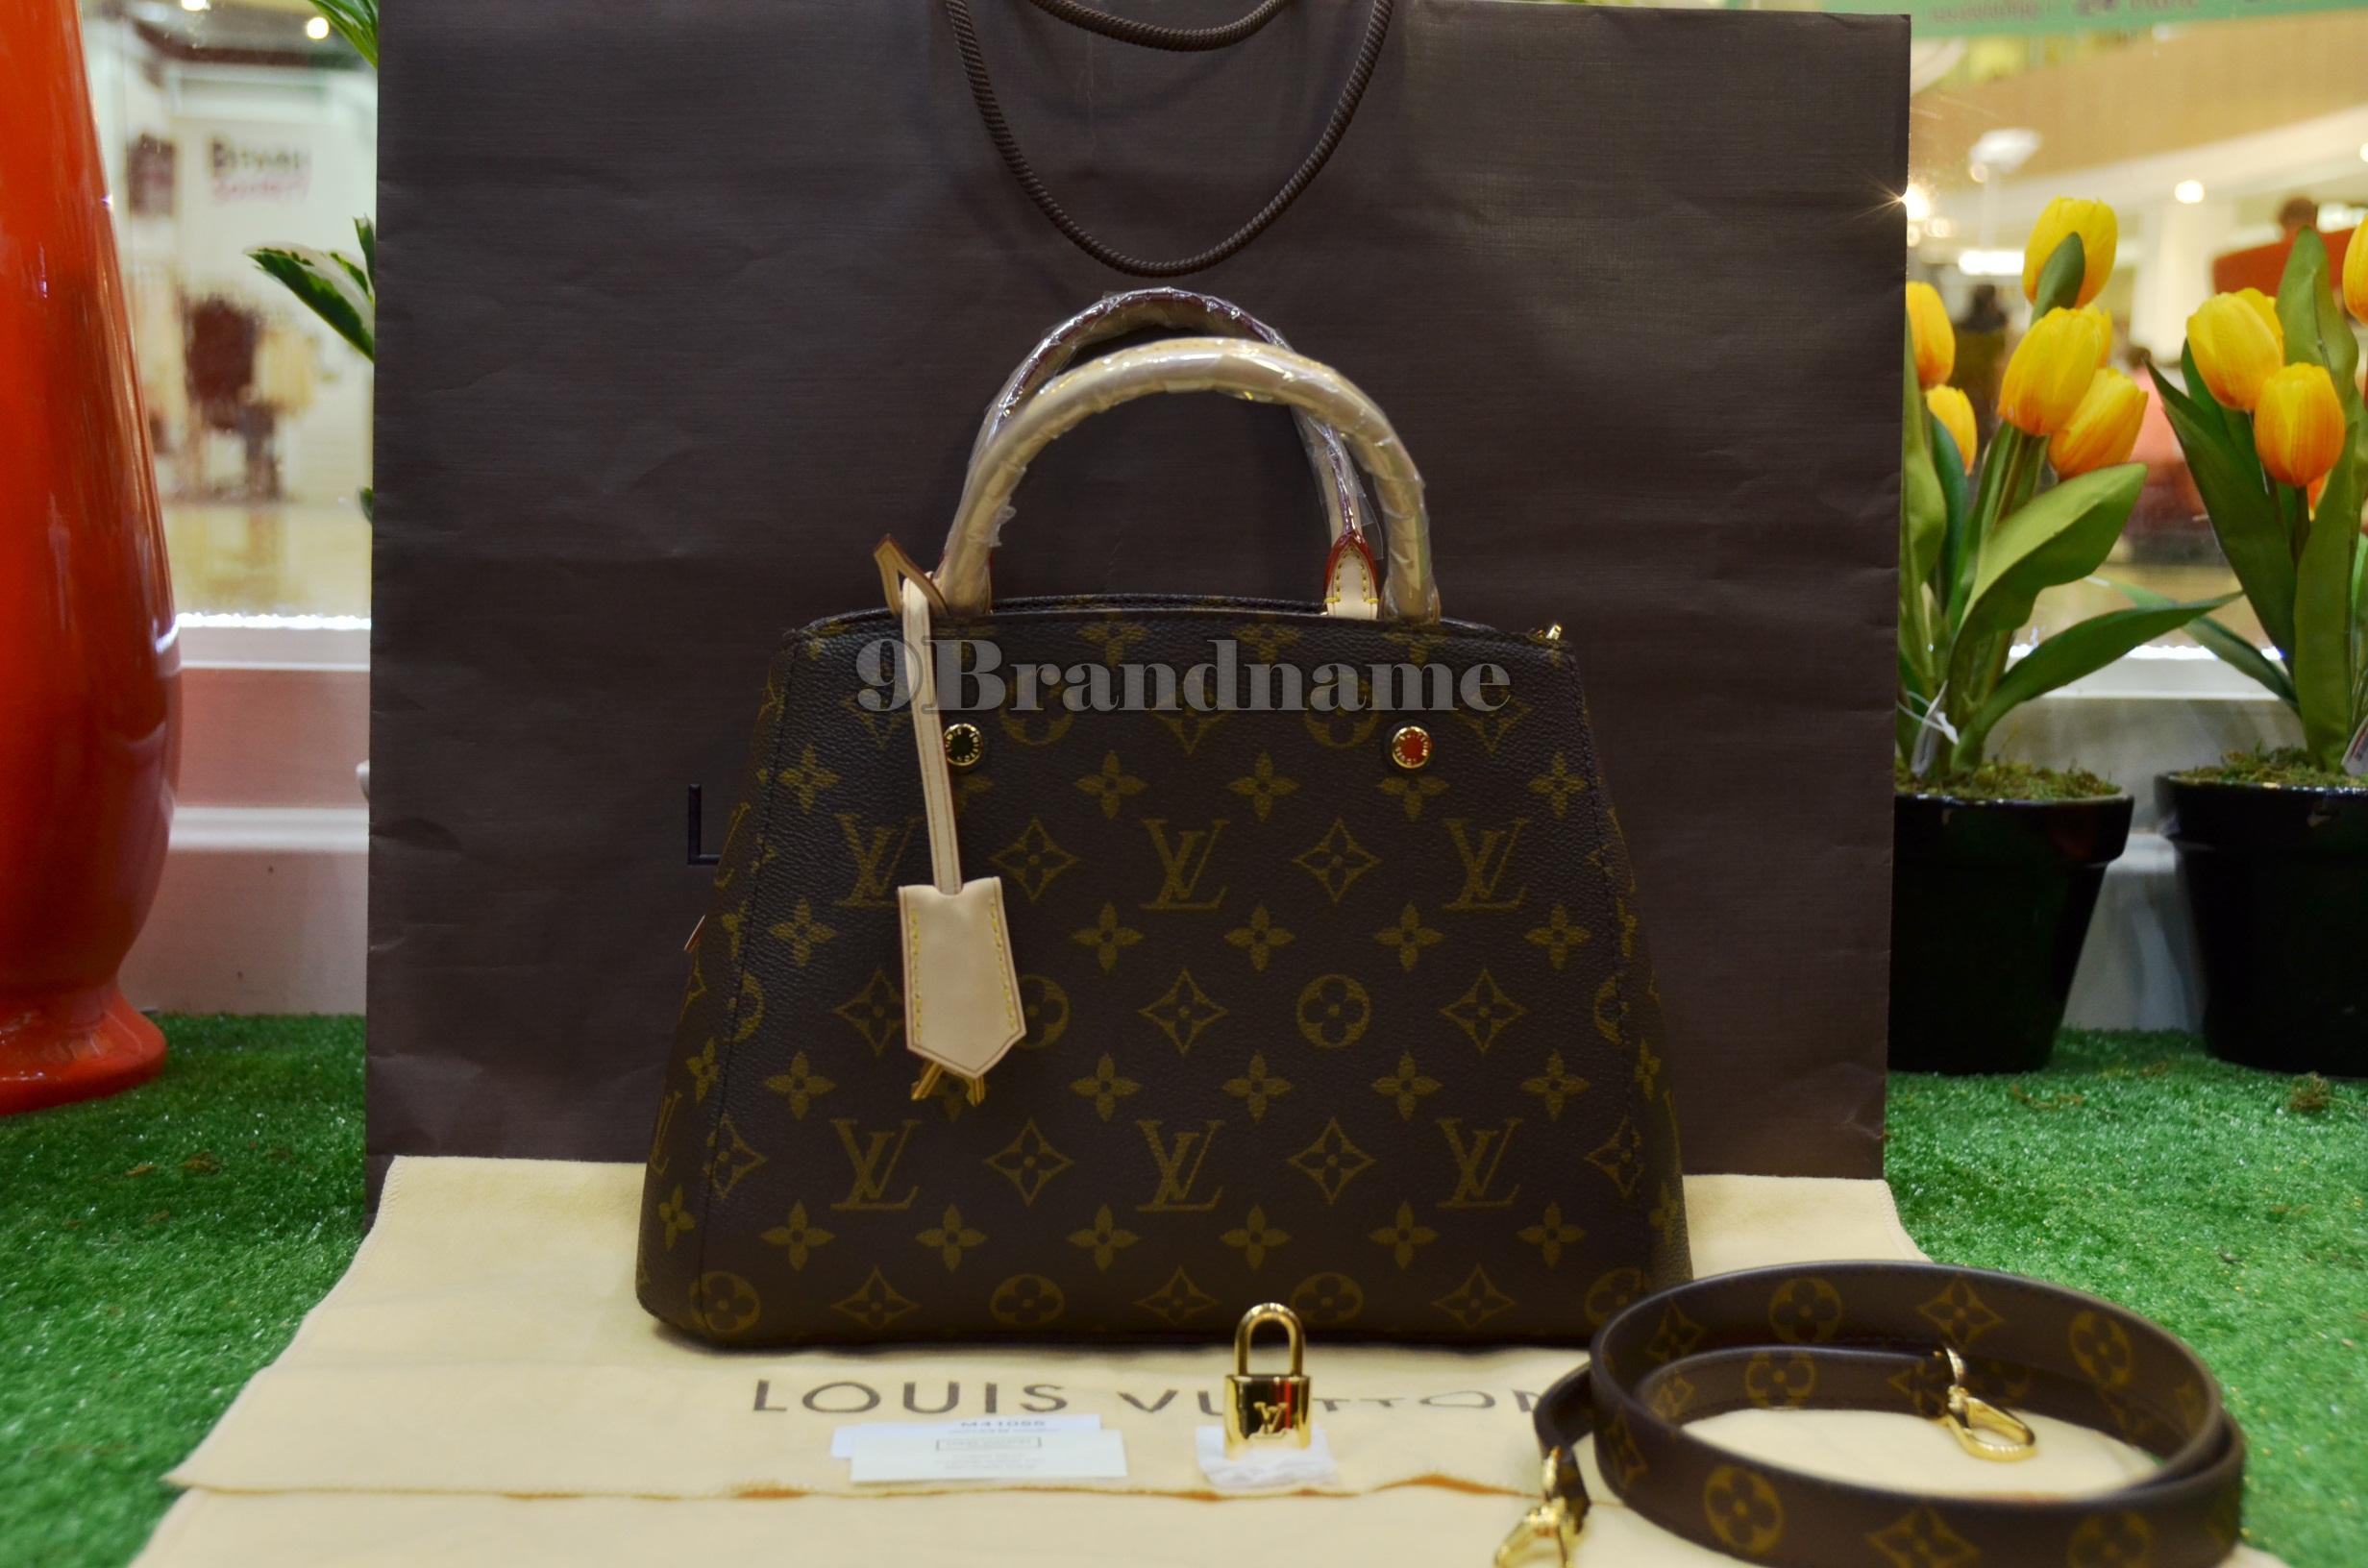 Louis Vuitton Montaigne BB Monogram - Authentic Bag  กระเป๋ารุ่นนิยมไซน์เล็กน่ารัก สามารถถือได้ สะพายได้ ค่ะ